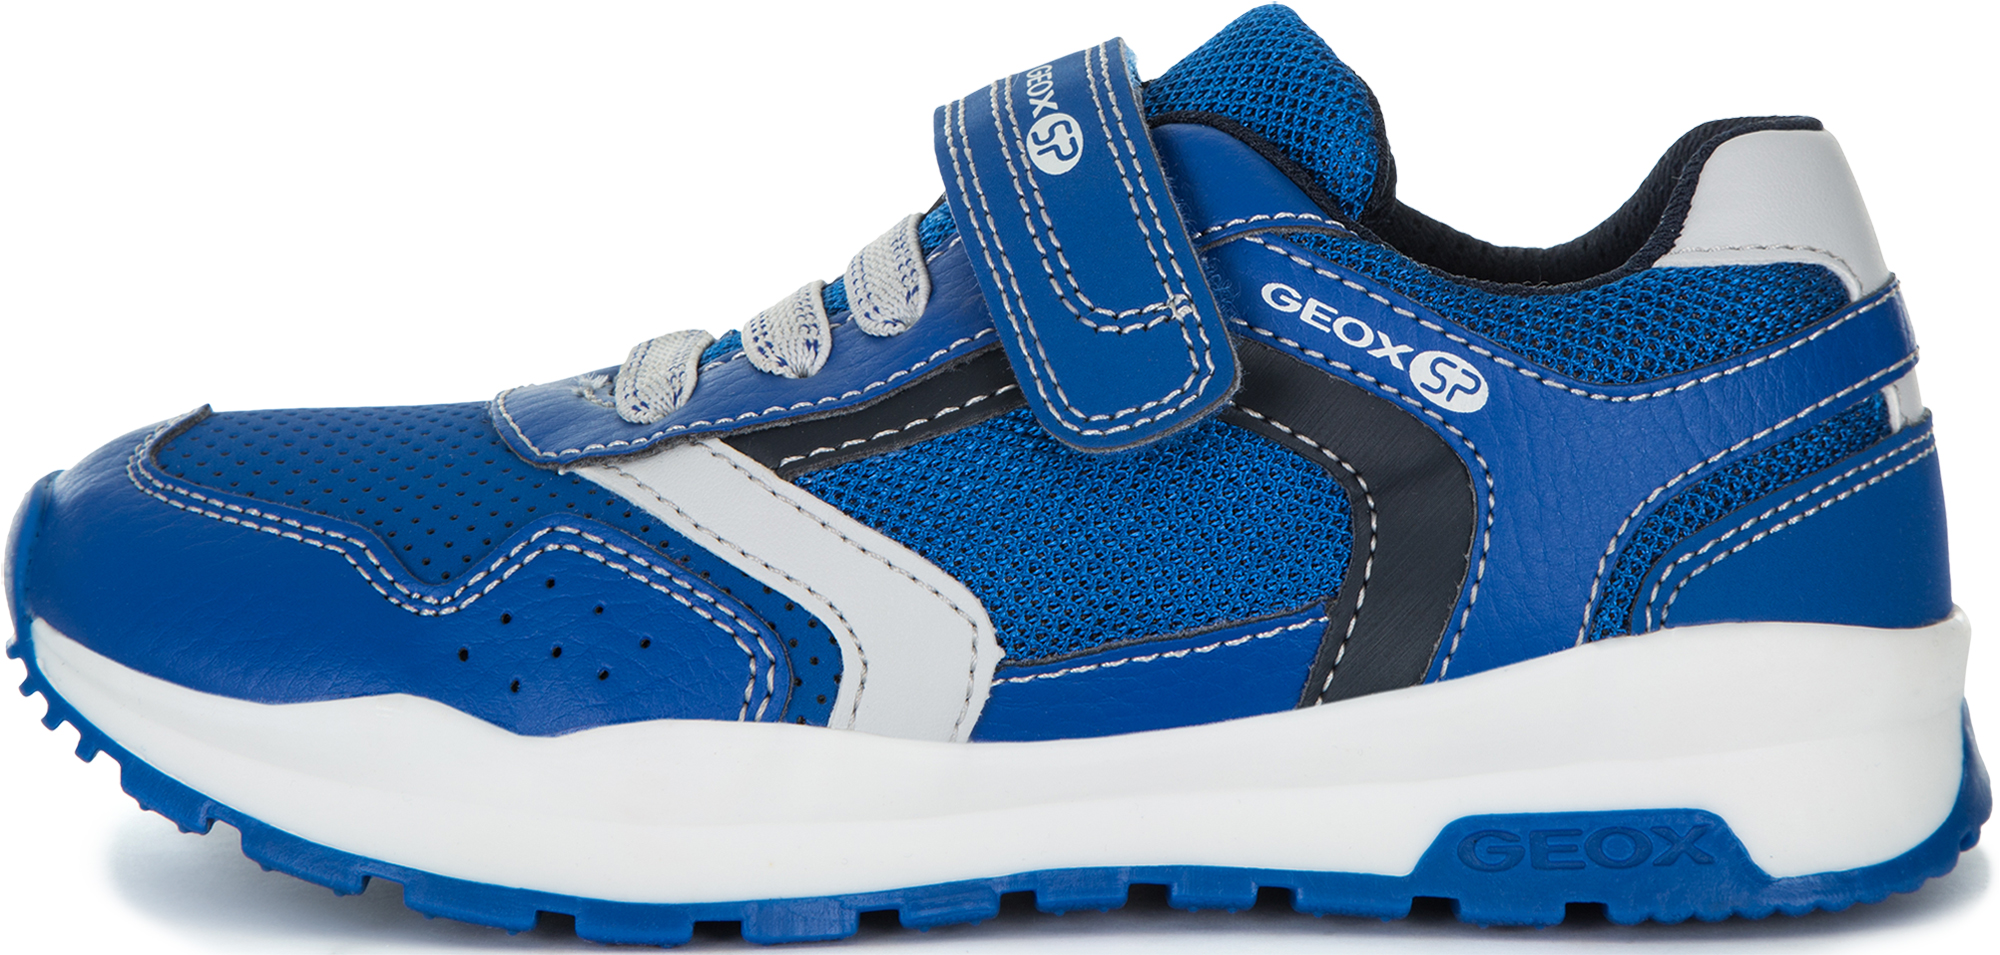 Geox Кроссовки для мальчиков Geox Coridan, размер 34